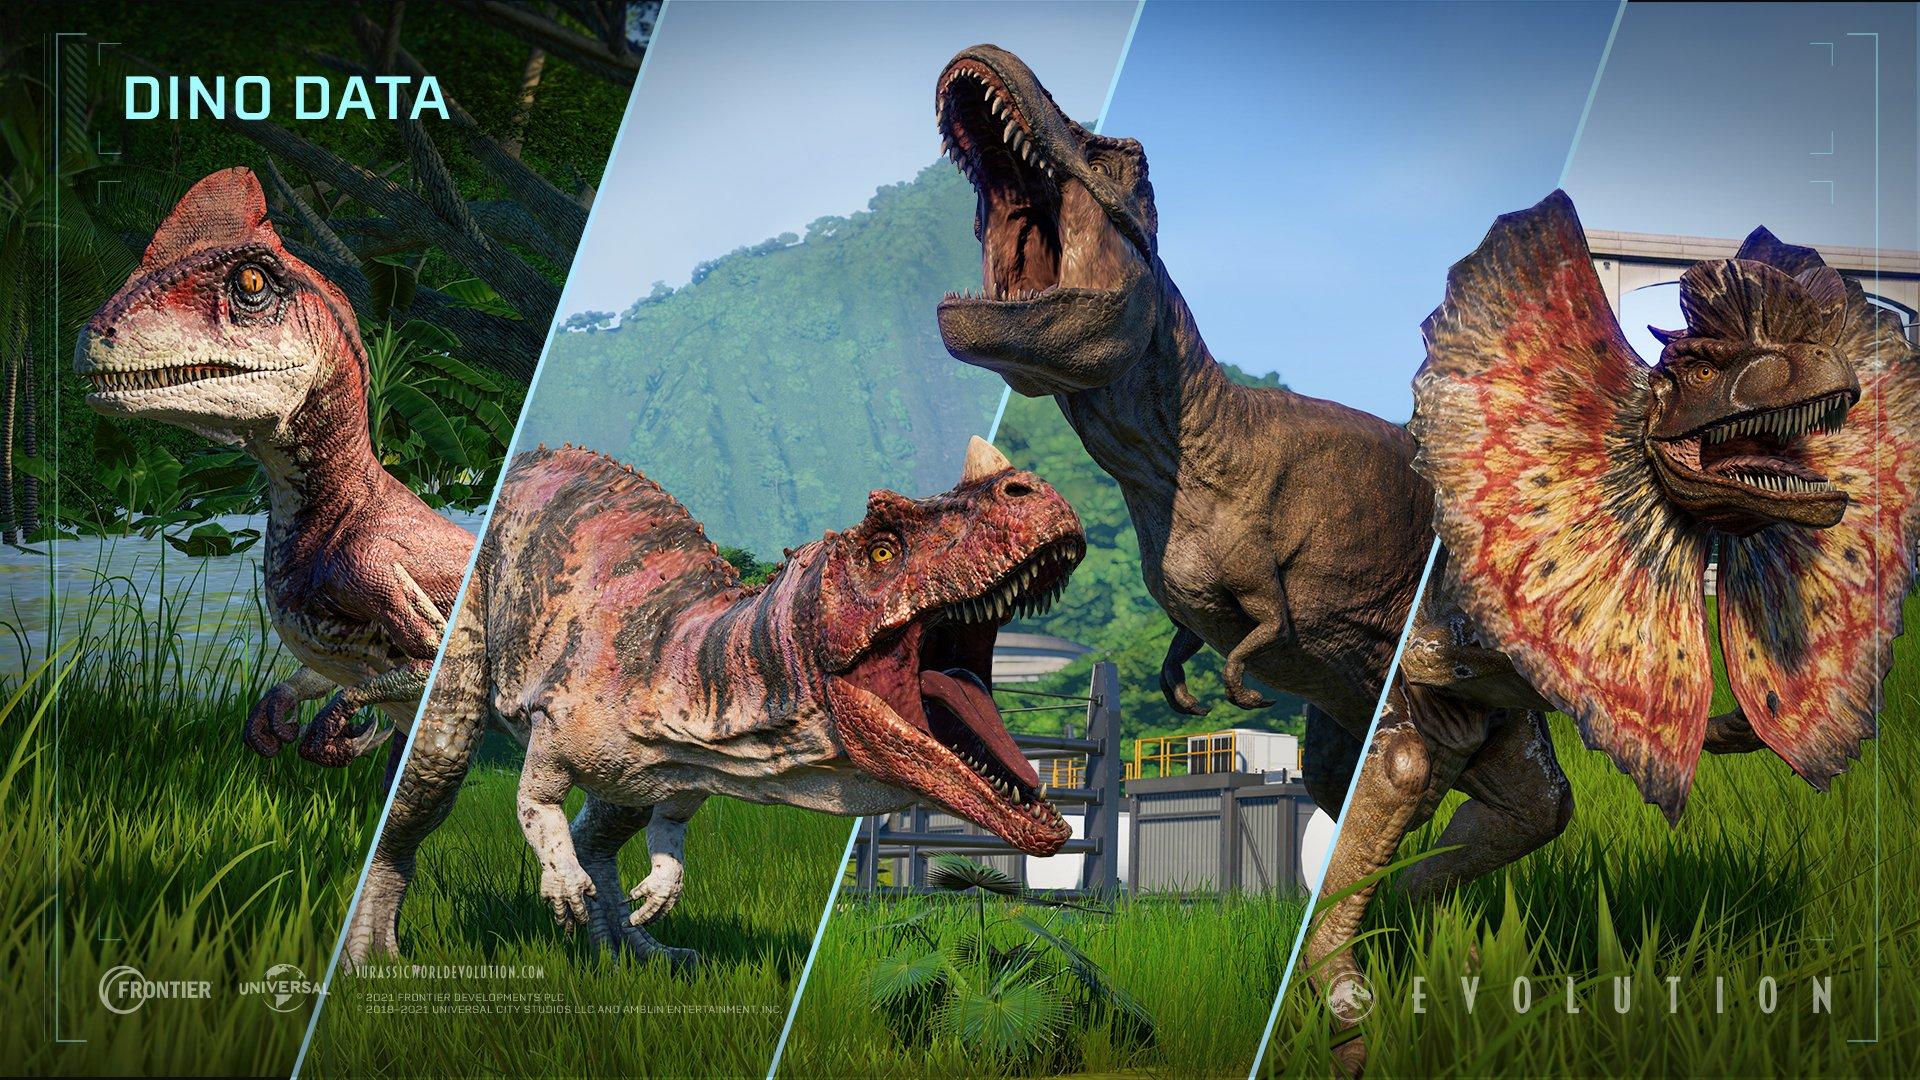 Jurassic World Evolution 2 on Twitter Besides the Velociraptor 1920x1080